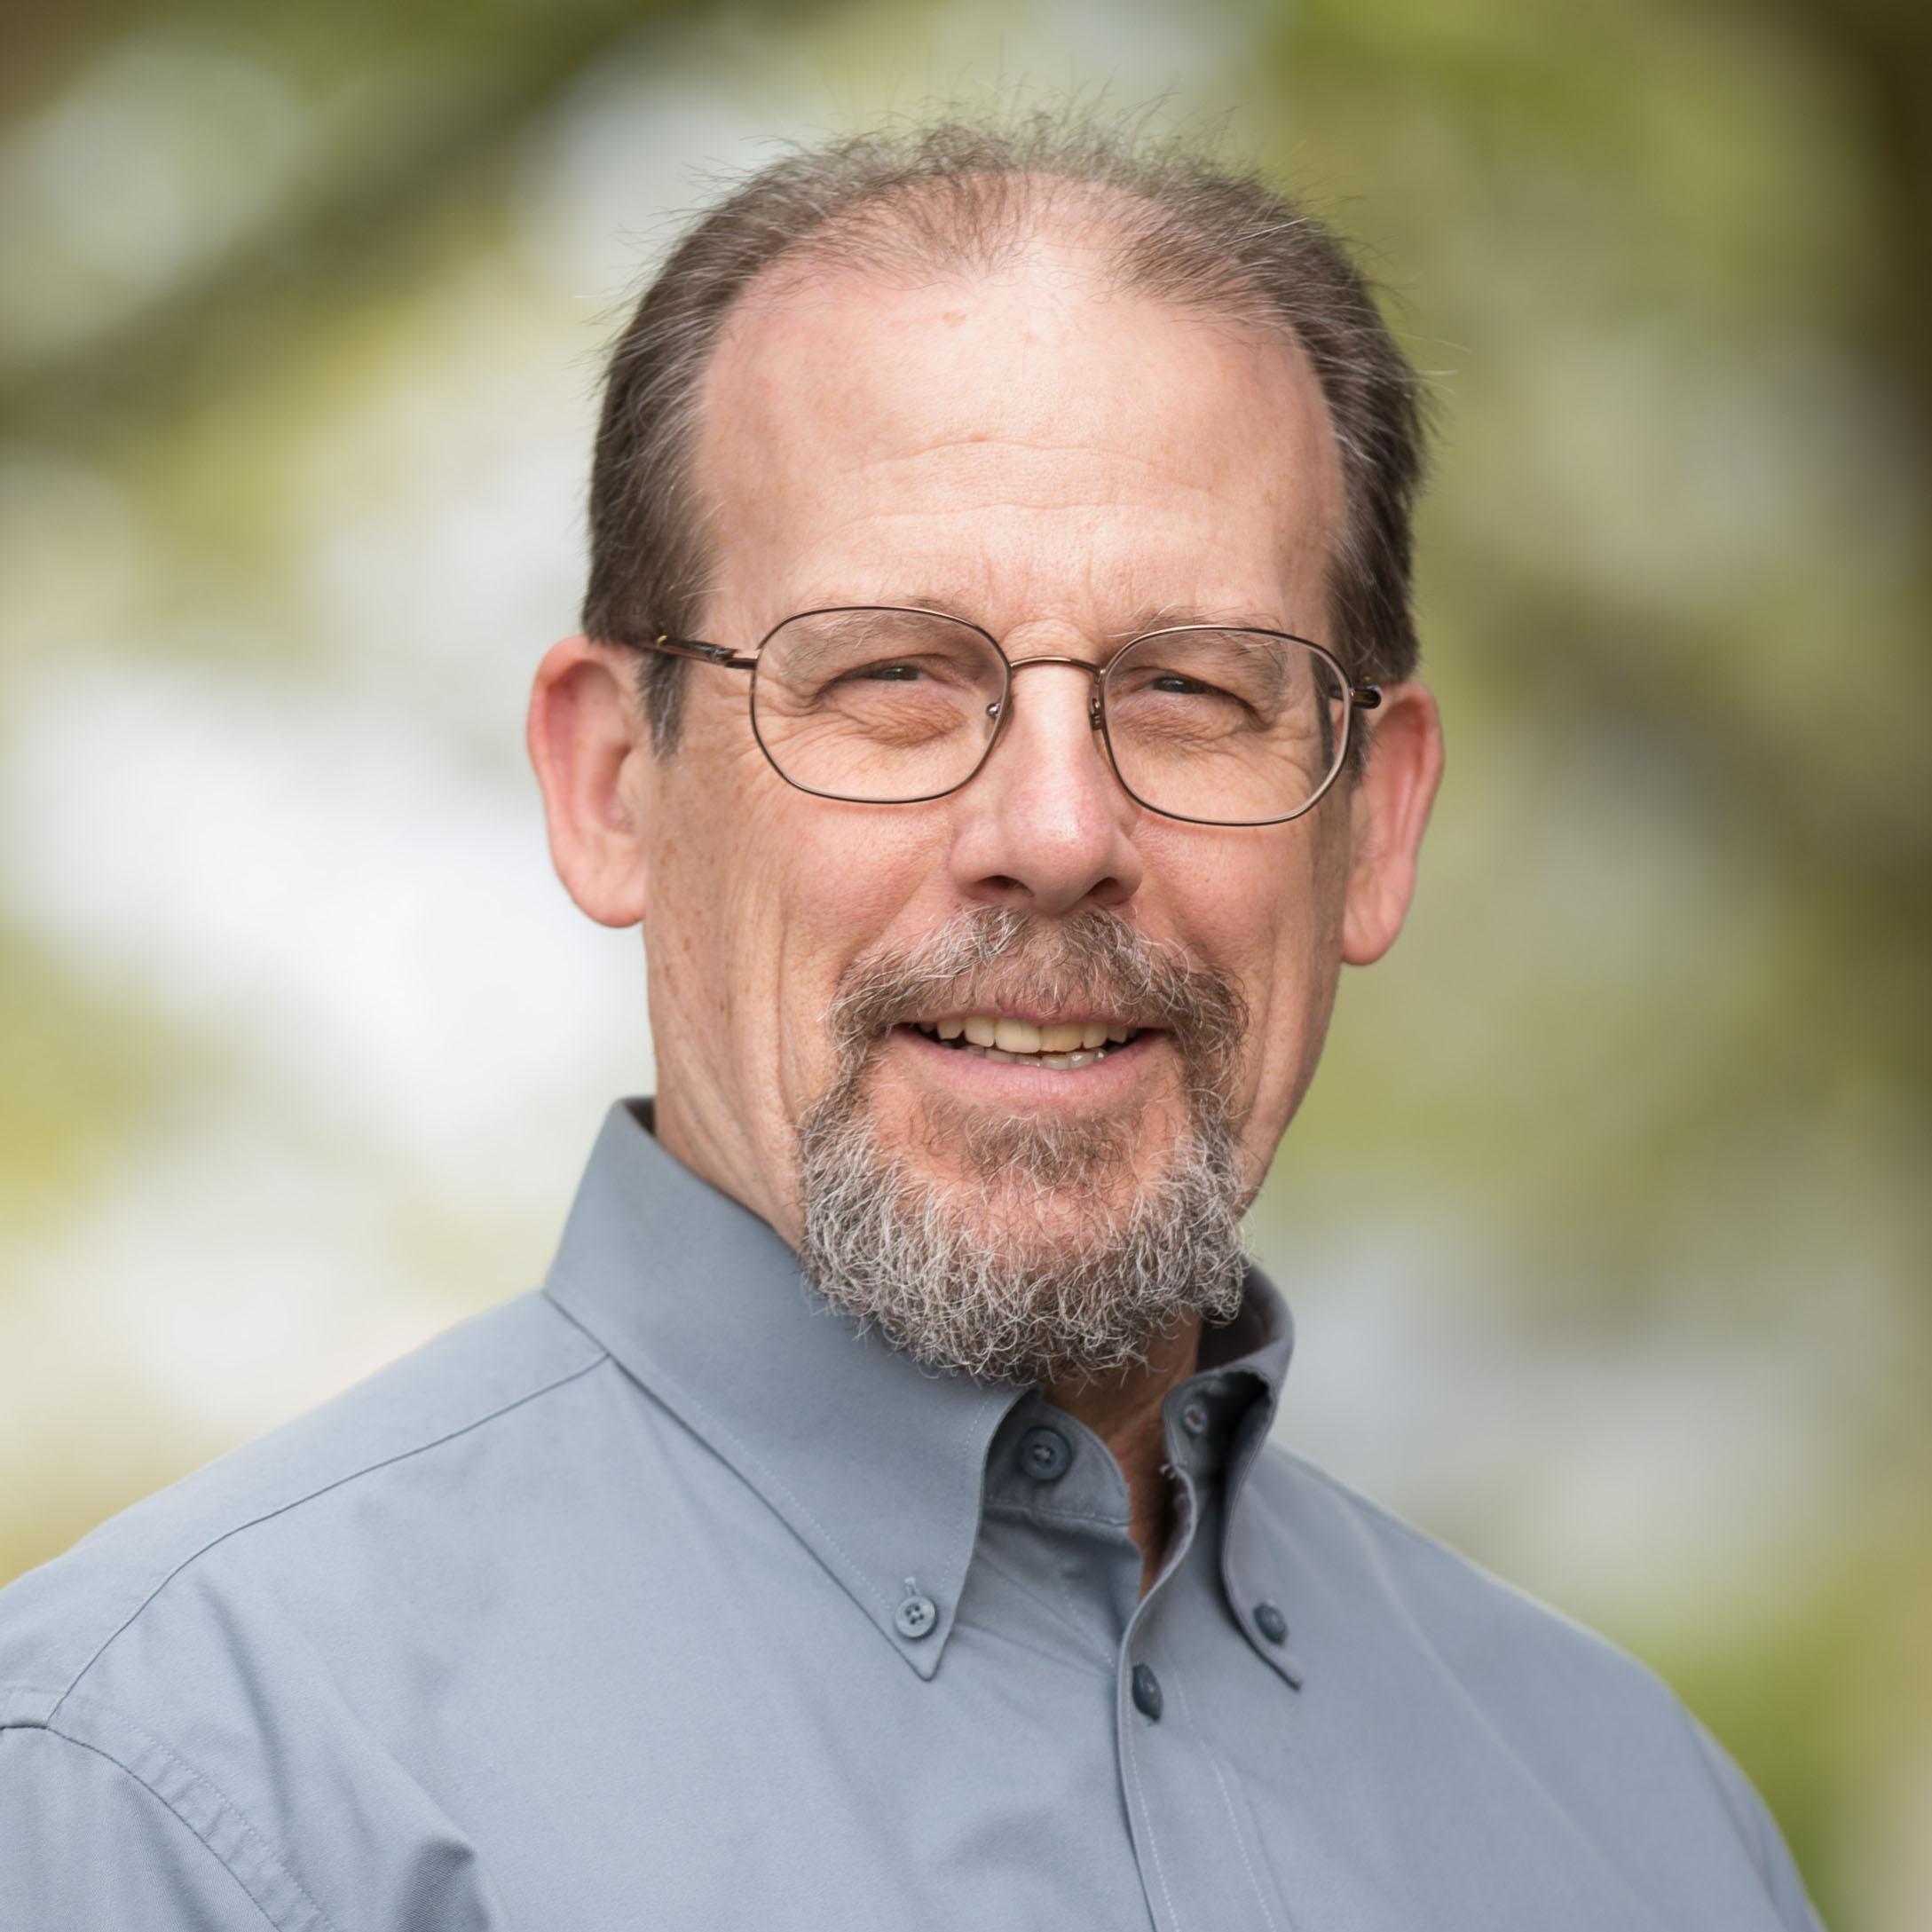 David Knox, MD